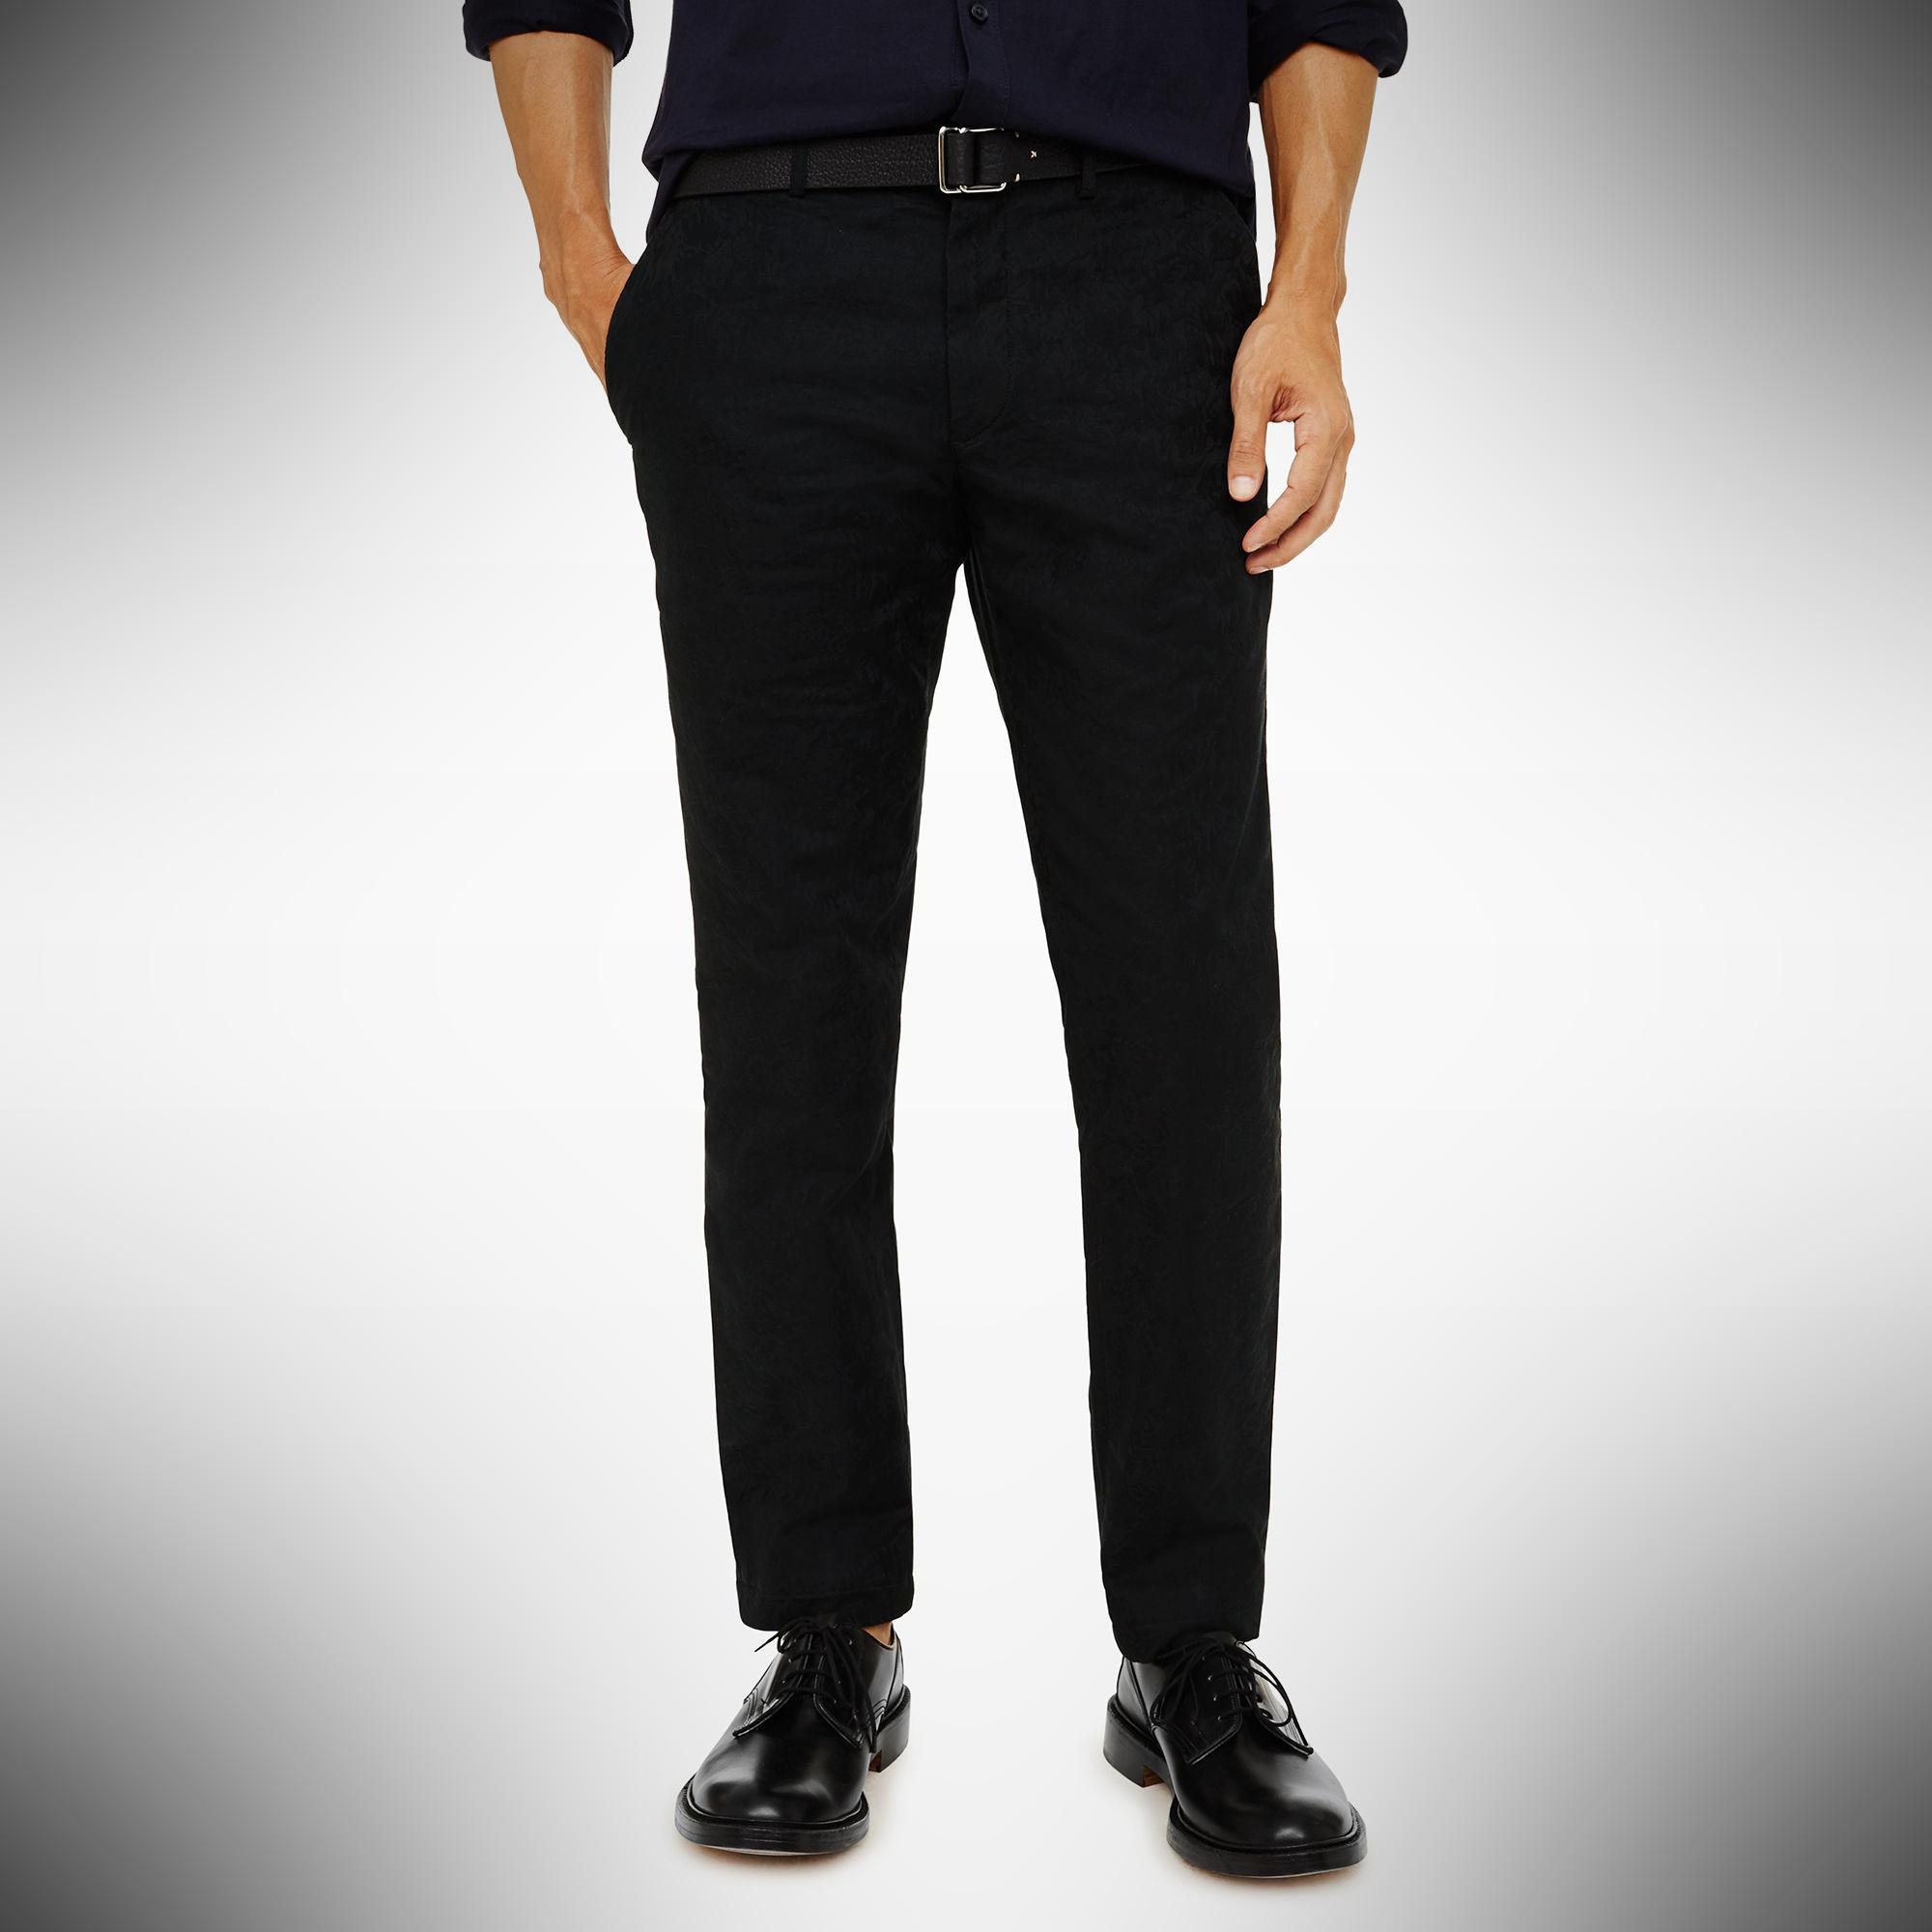 Club Monaco Connor Chino Floral Jacquard – summer dress pants for men